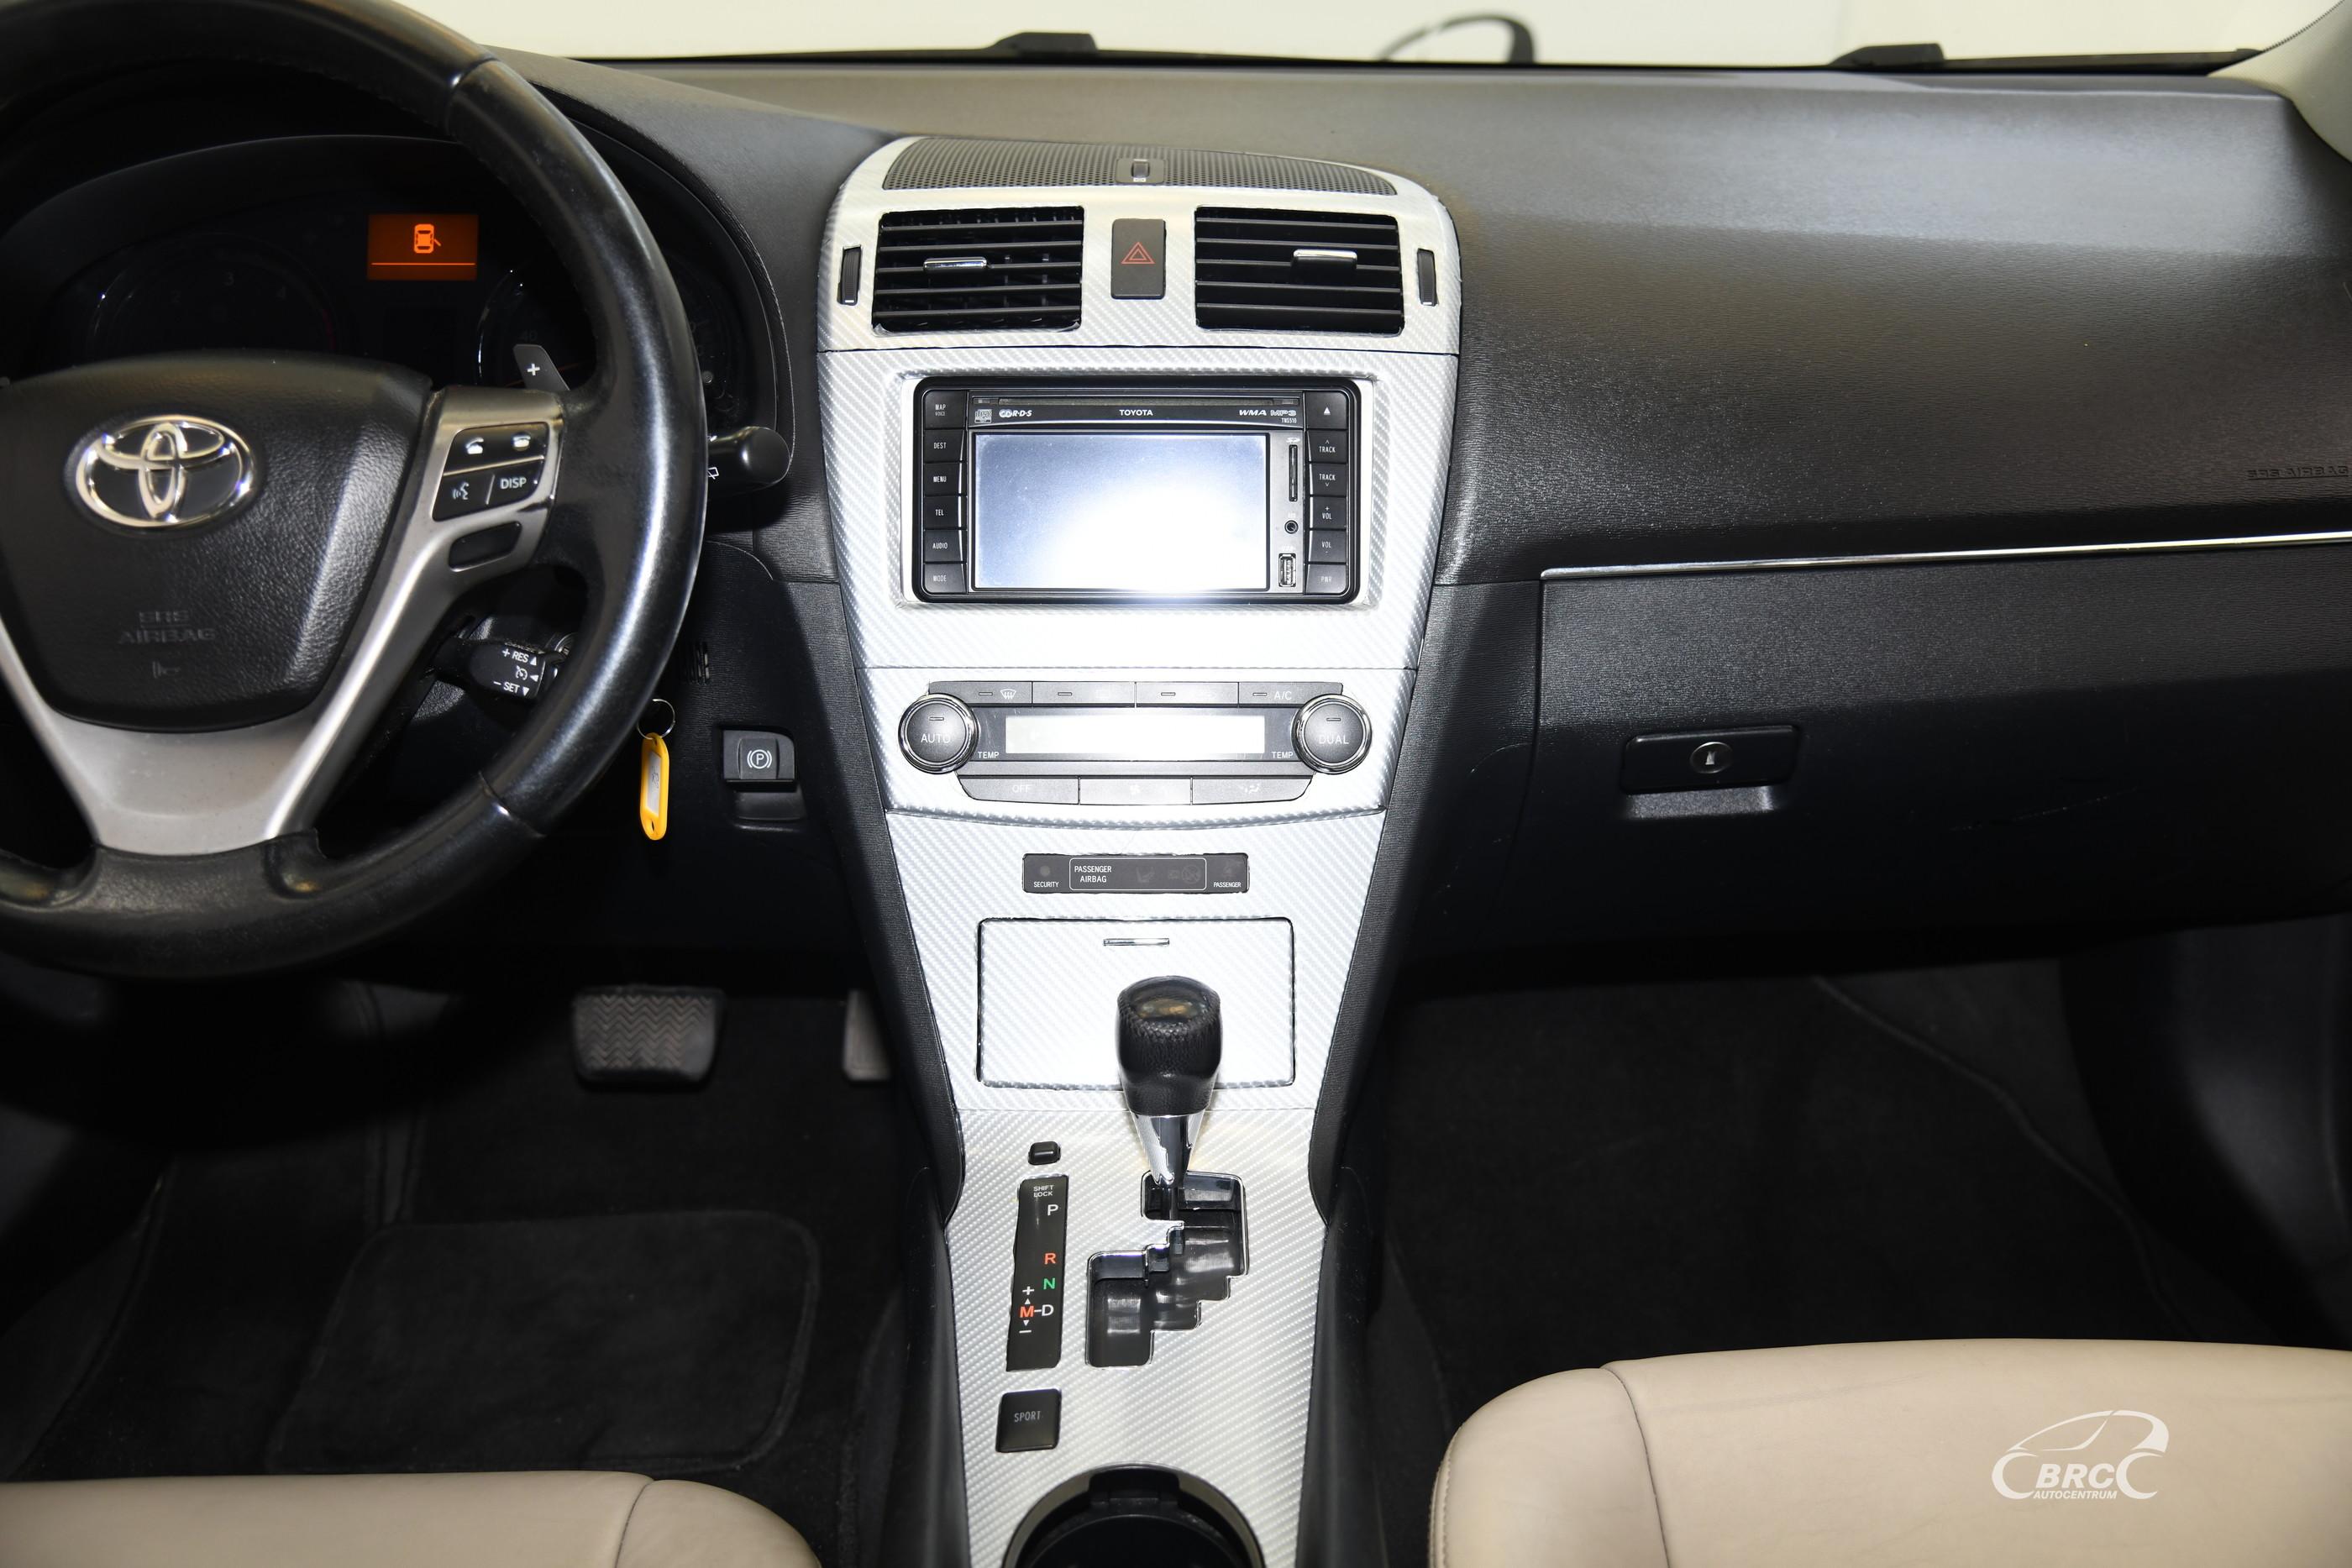 Toyota Avensis 2.2 D-CAT Prestige Automatas